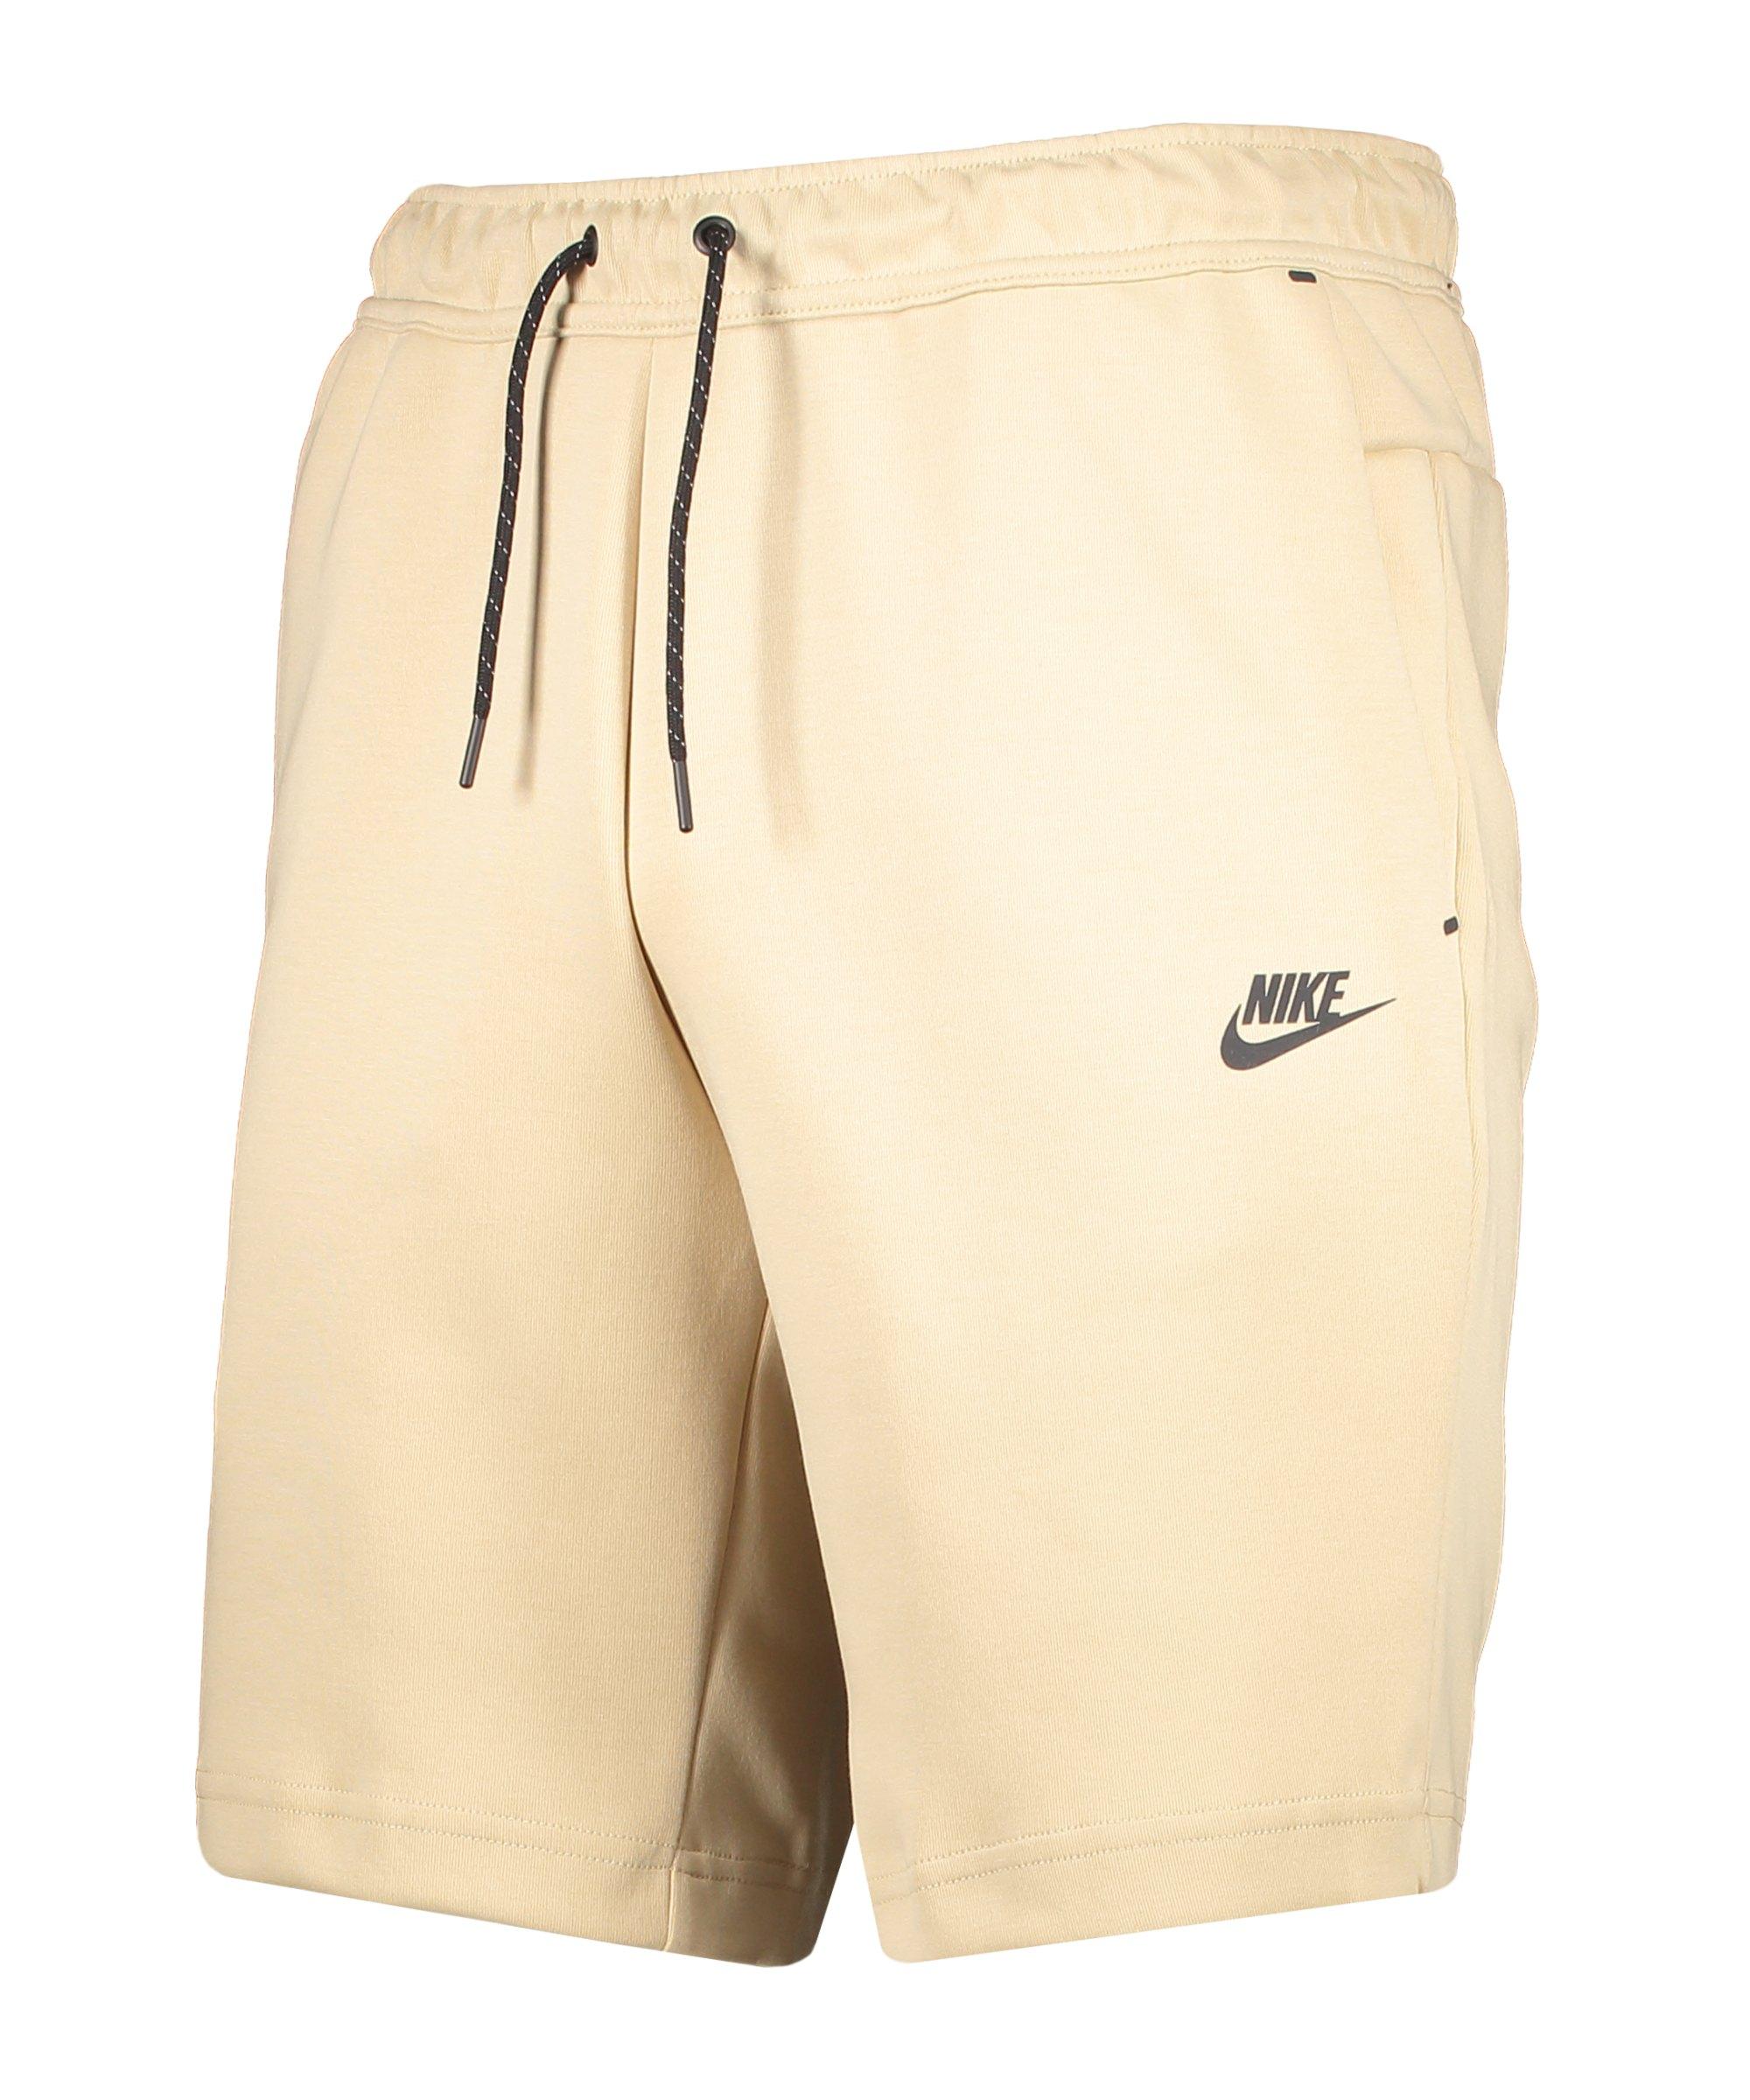 Nike Tech Fleece Short Beige F224 - braun